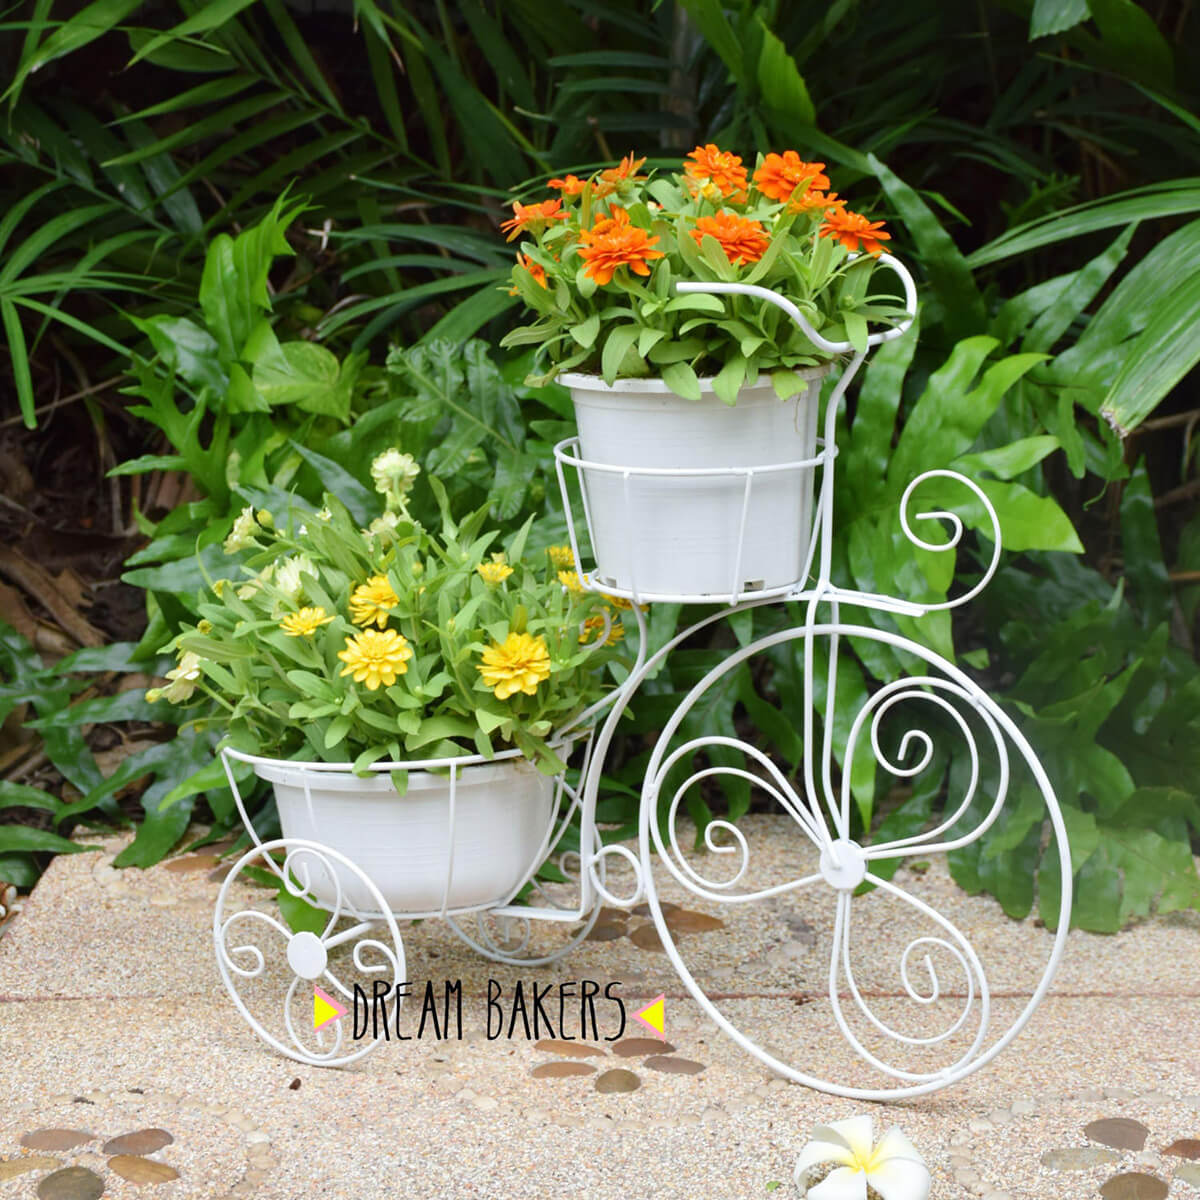 Adorable Vintage Metal Bicycle Planter